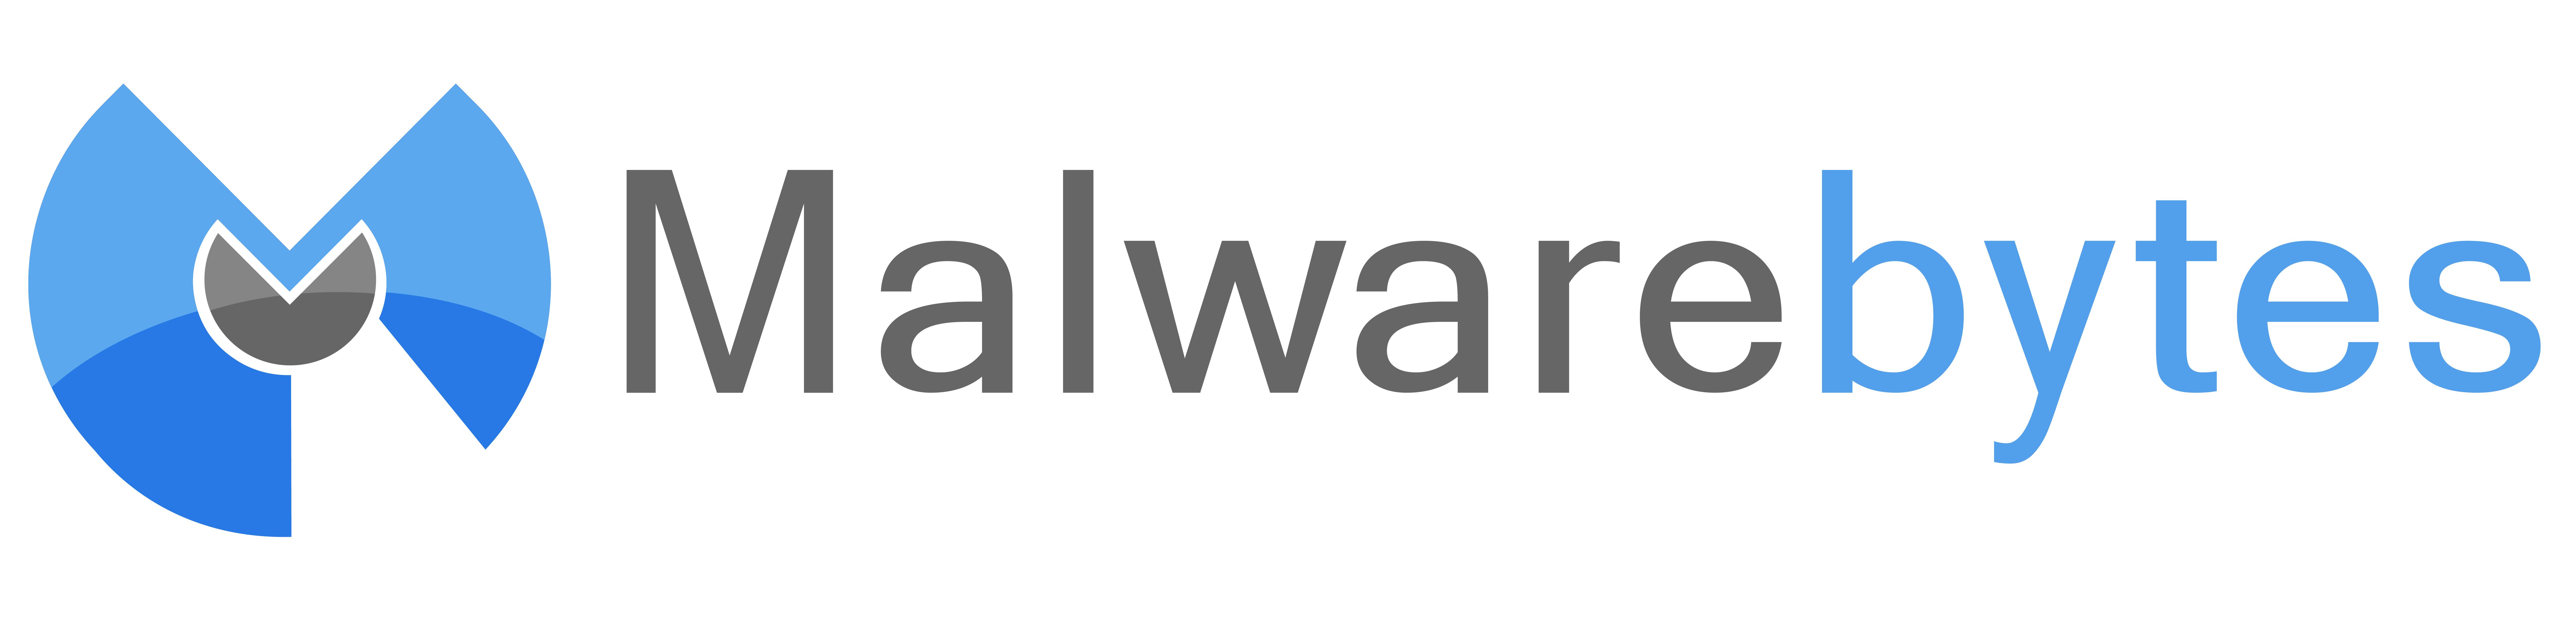 Maleware Byte